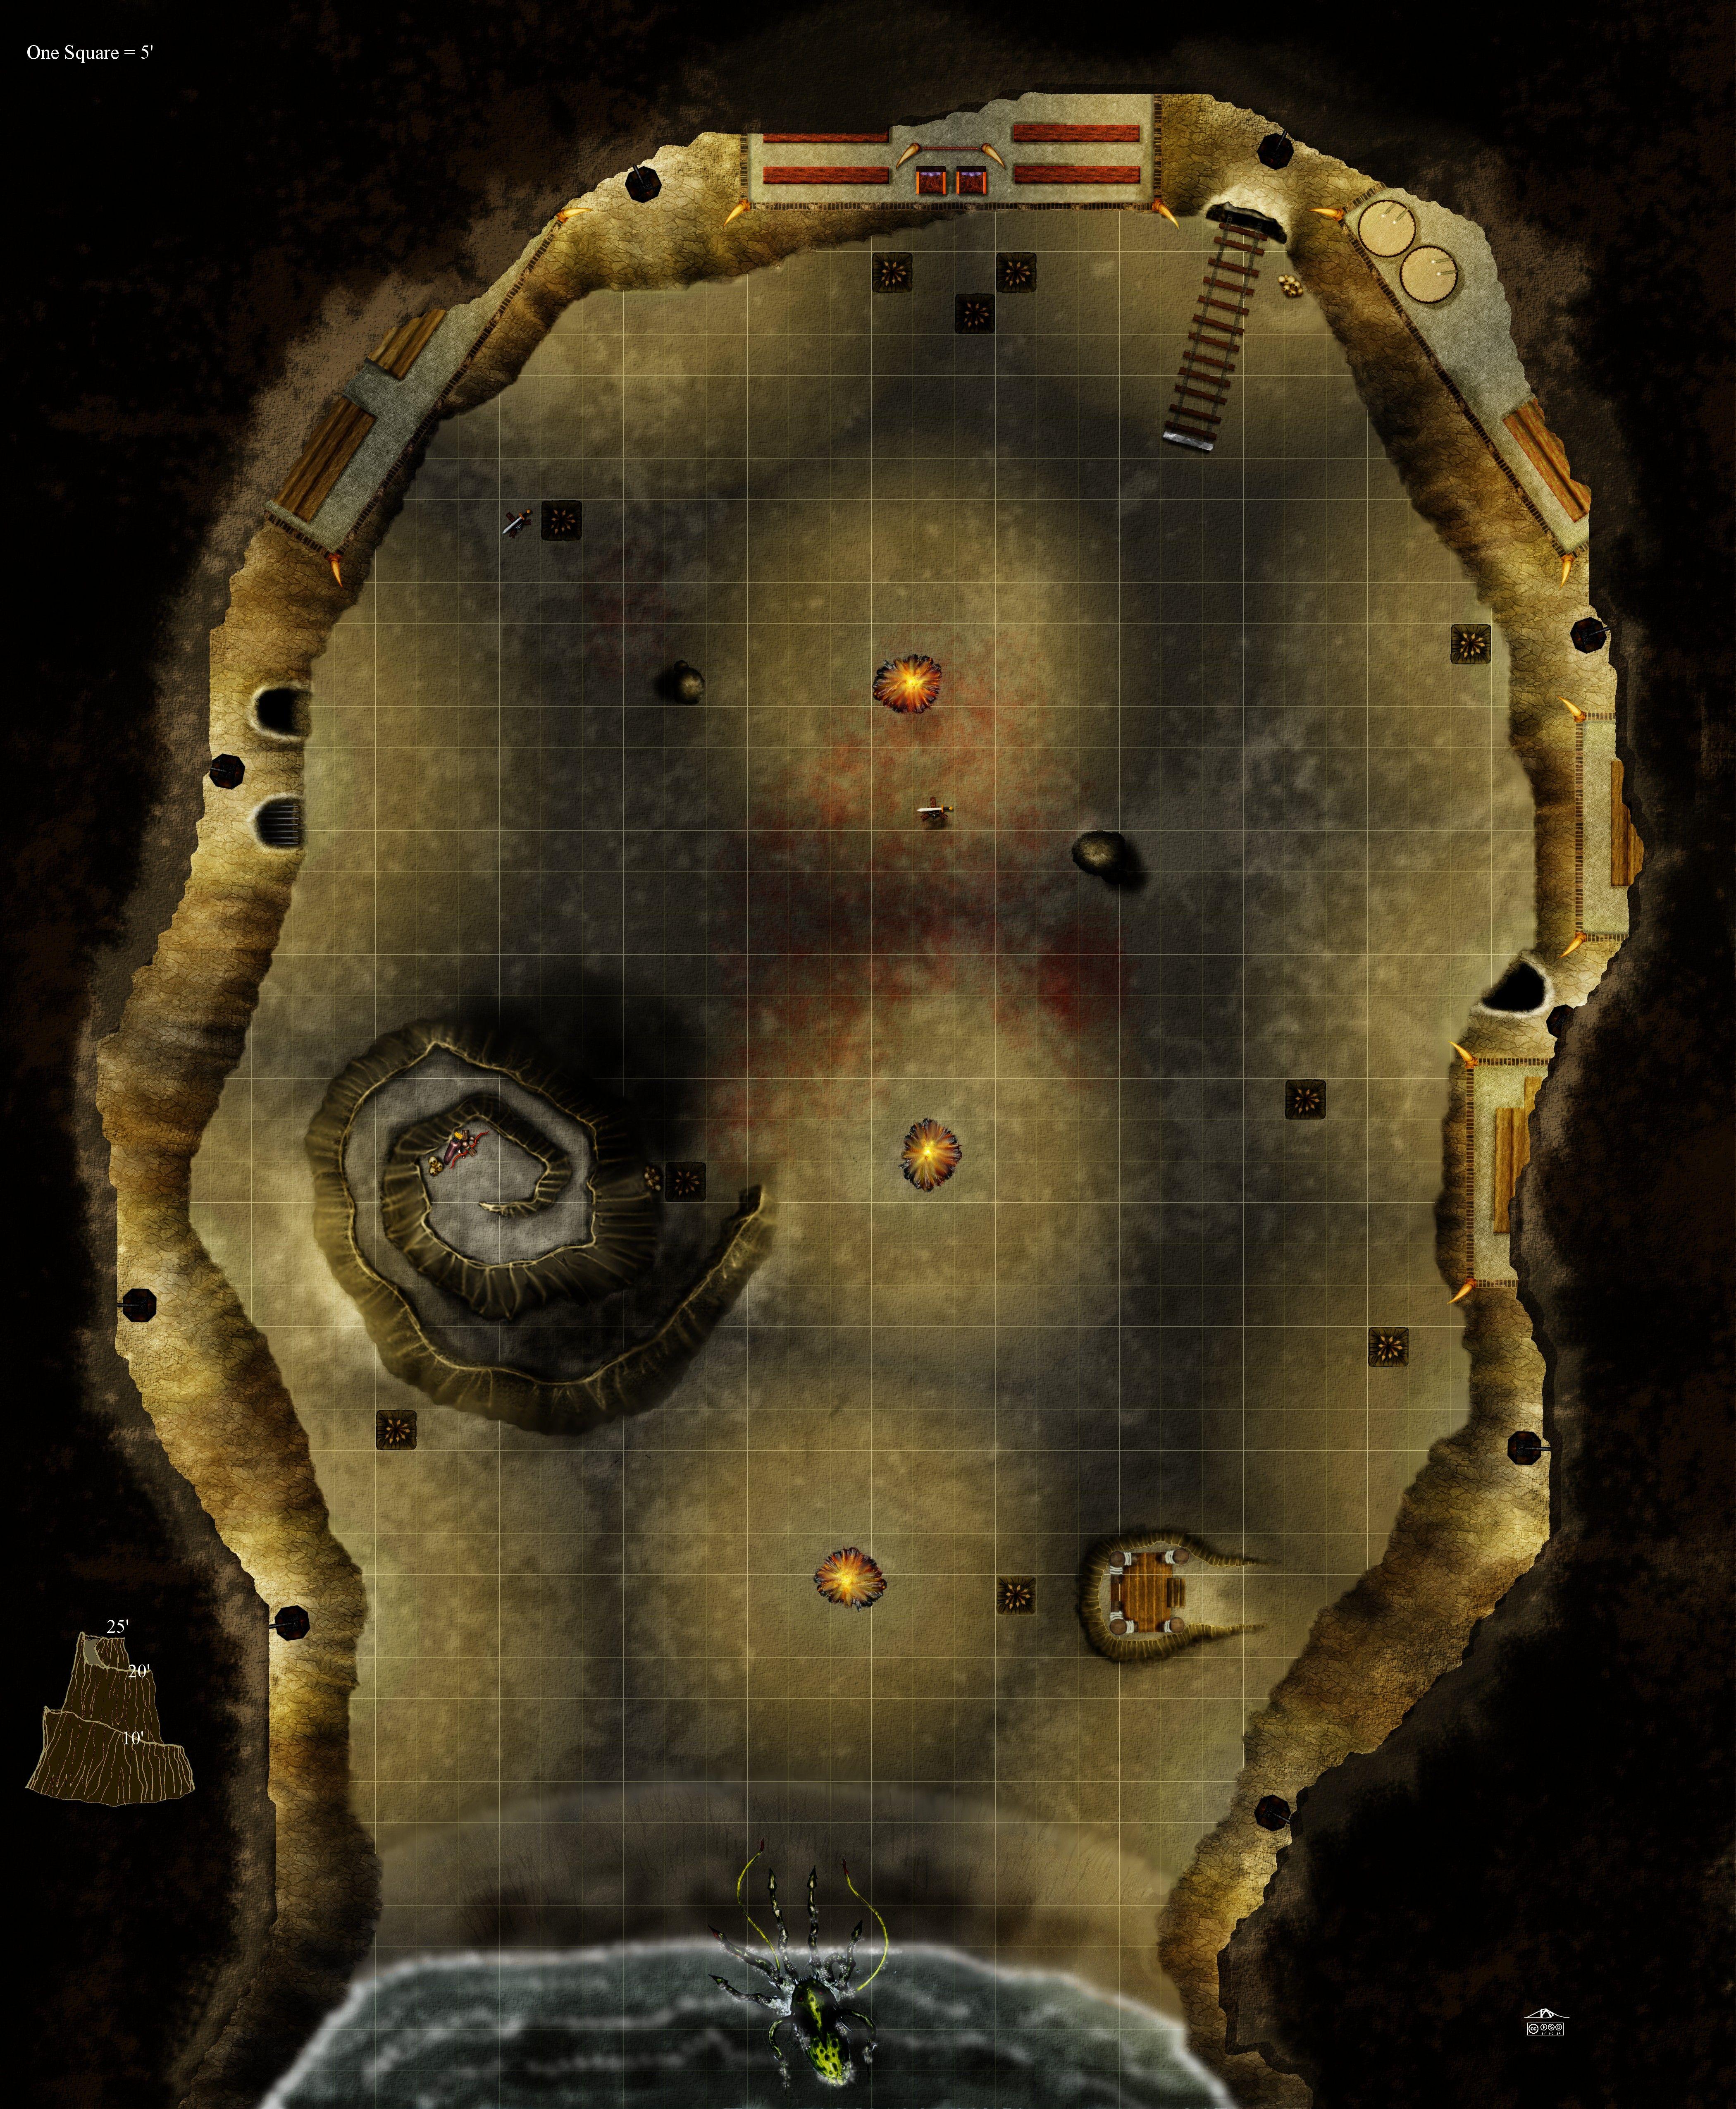 Arena Dnd Map : arena, Jaxilon-albums-battlemaps-picture44646-cavern-arena.jpg, (immagine, JPEG,, Pixel), Mapas, Dungeon,